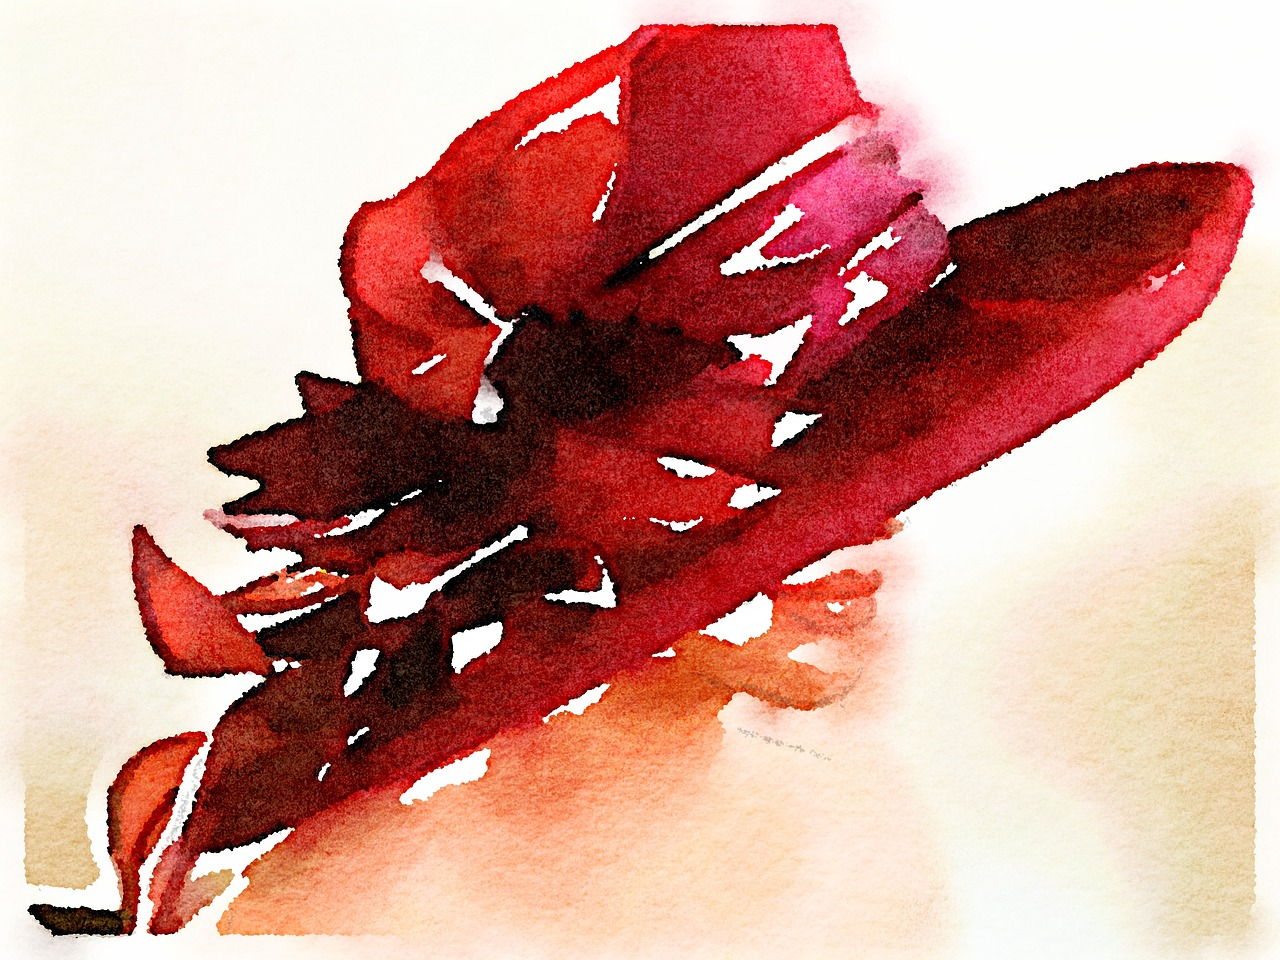 watercolor-1904324_1280.jpg